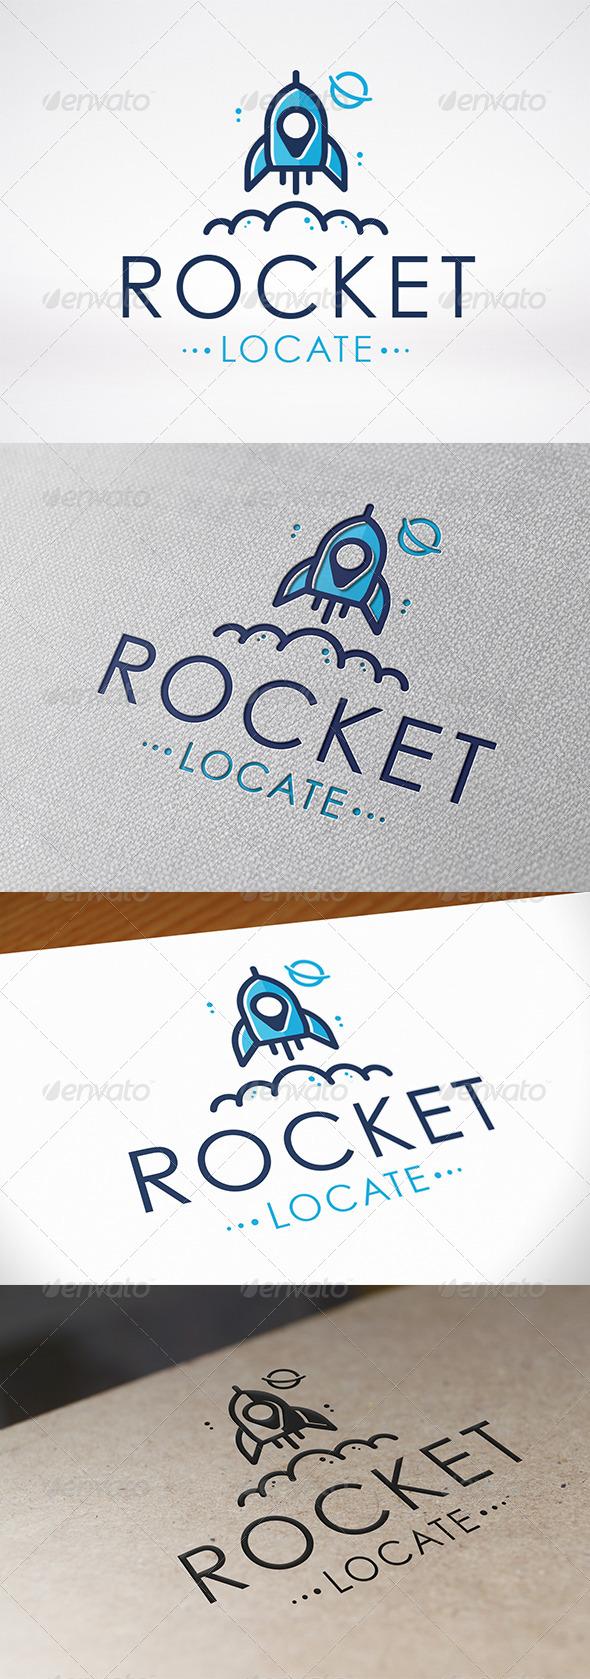 Rocket Locator Logo Template - Objects Logo Templates